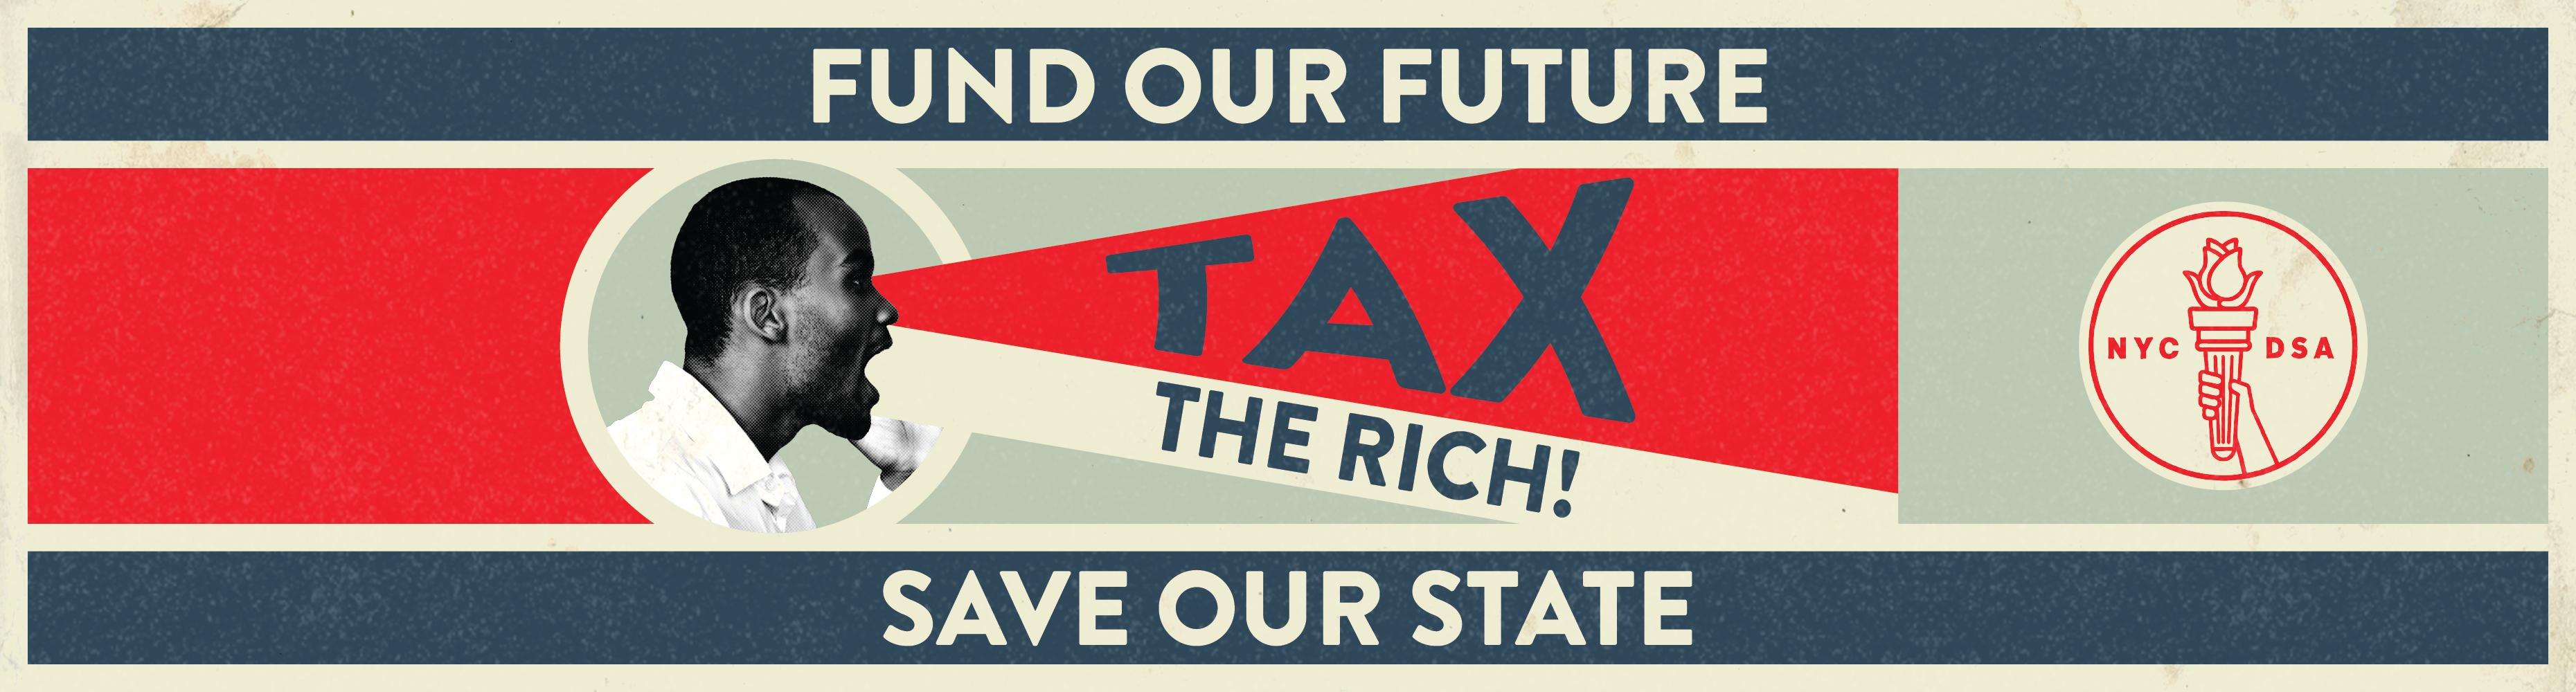 NYC-DSA Tax The Rich Campaign